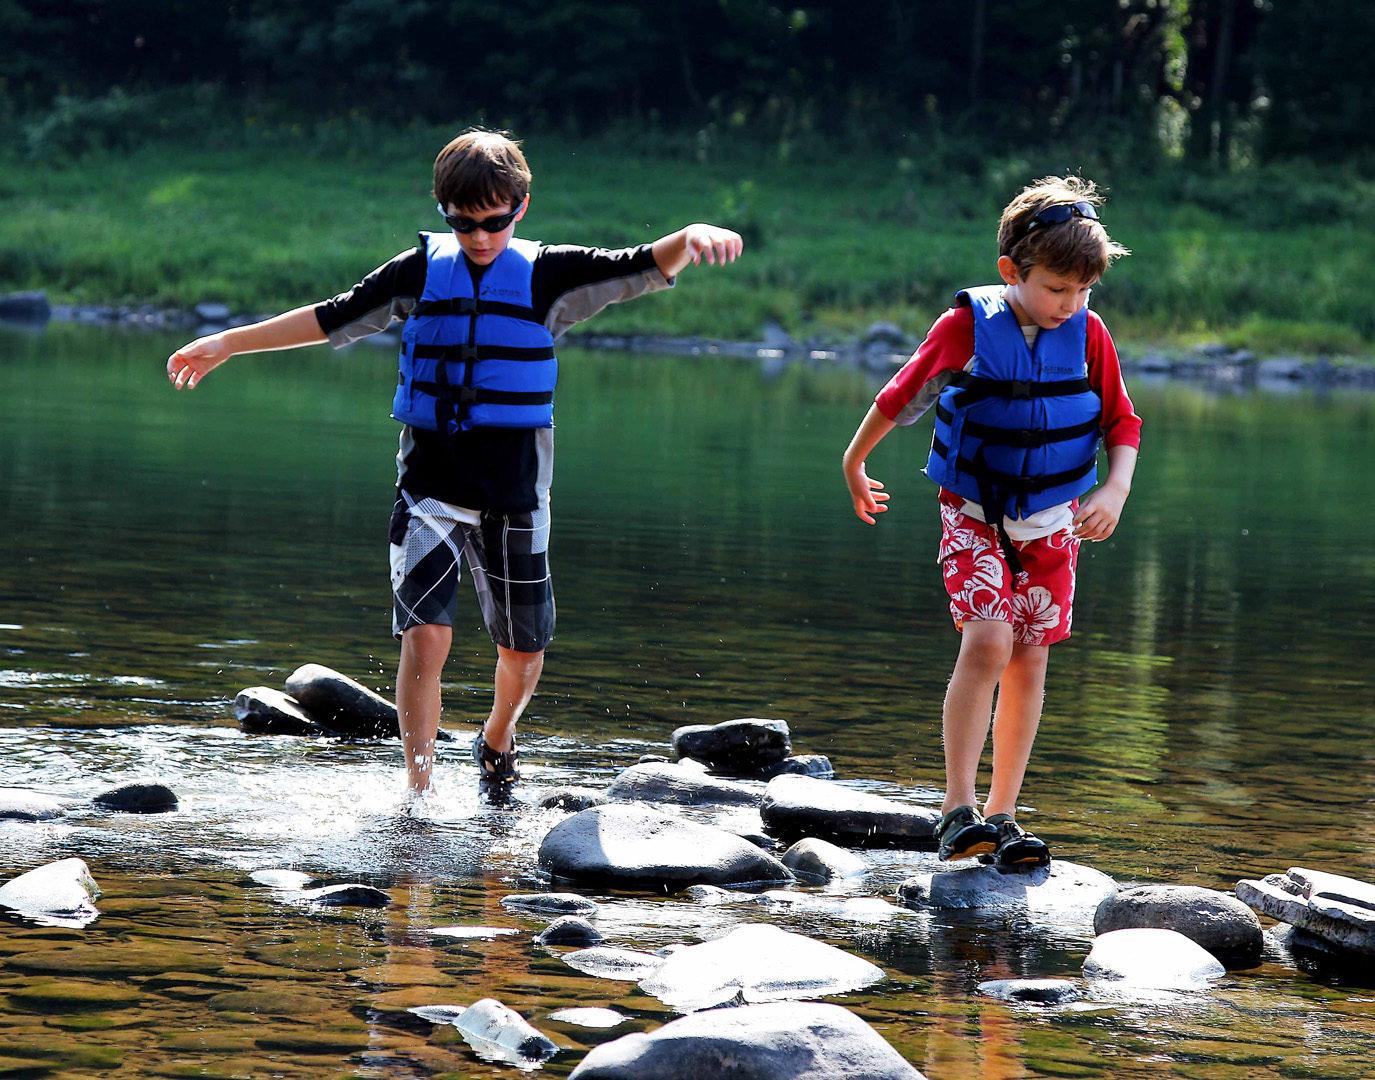 two boys navigating the river rocks Indian Head Canoeing Rafting Kayaking Tubing Delaware River